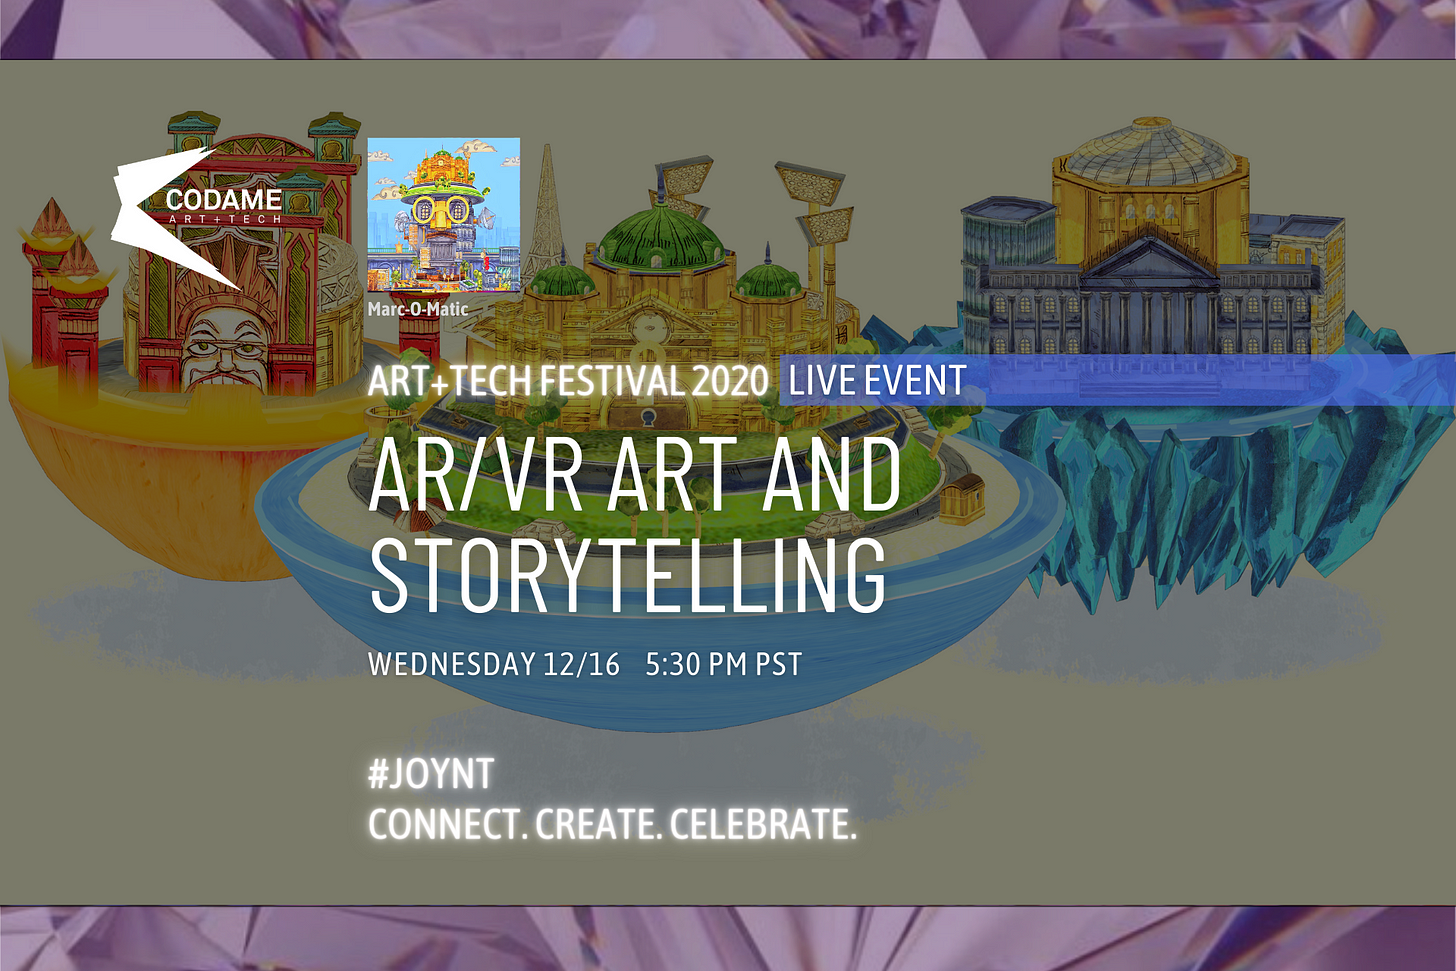 AR/VR Art and Storytelling